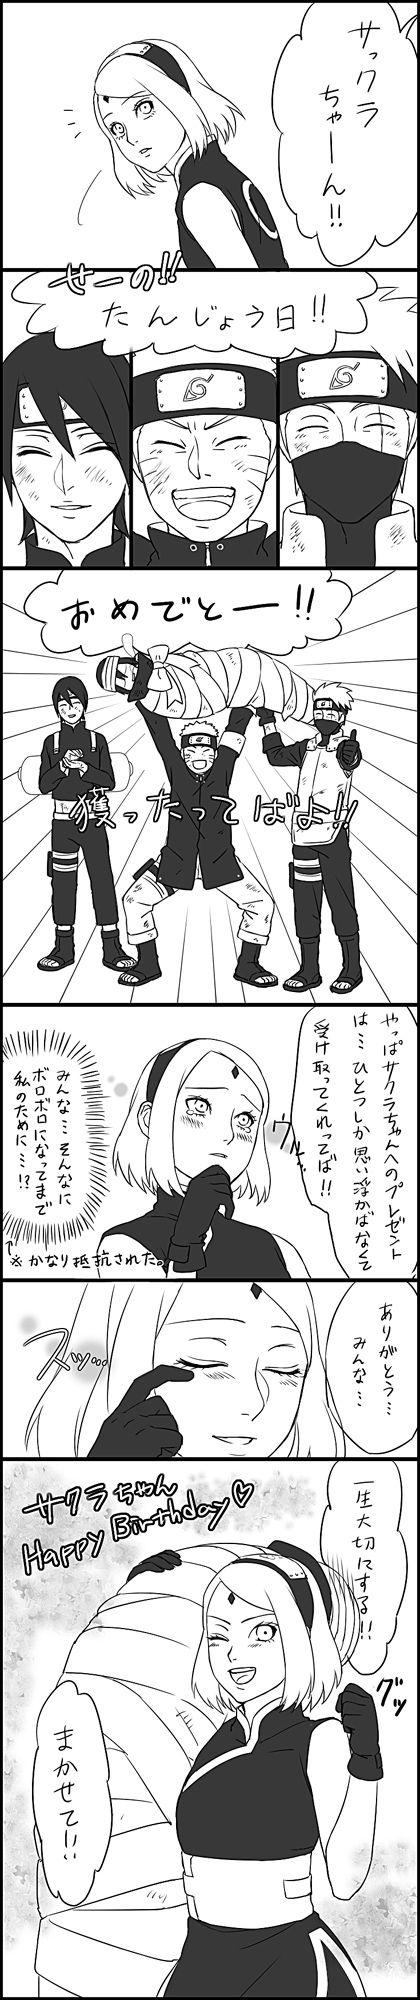 Sasuke x Sakura. Sympa les gars ! ^^ Mais aucune solidarité masculine avec ce pauvre Sasuke...